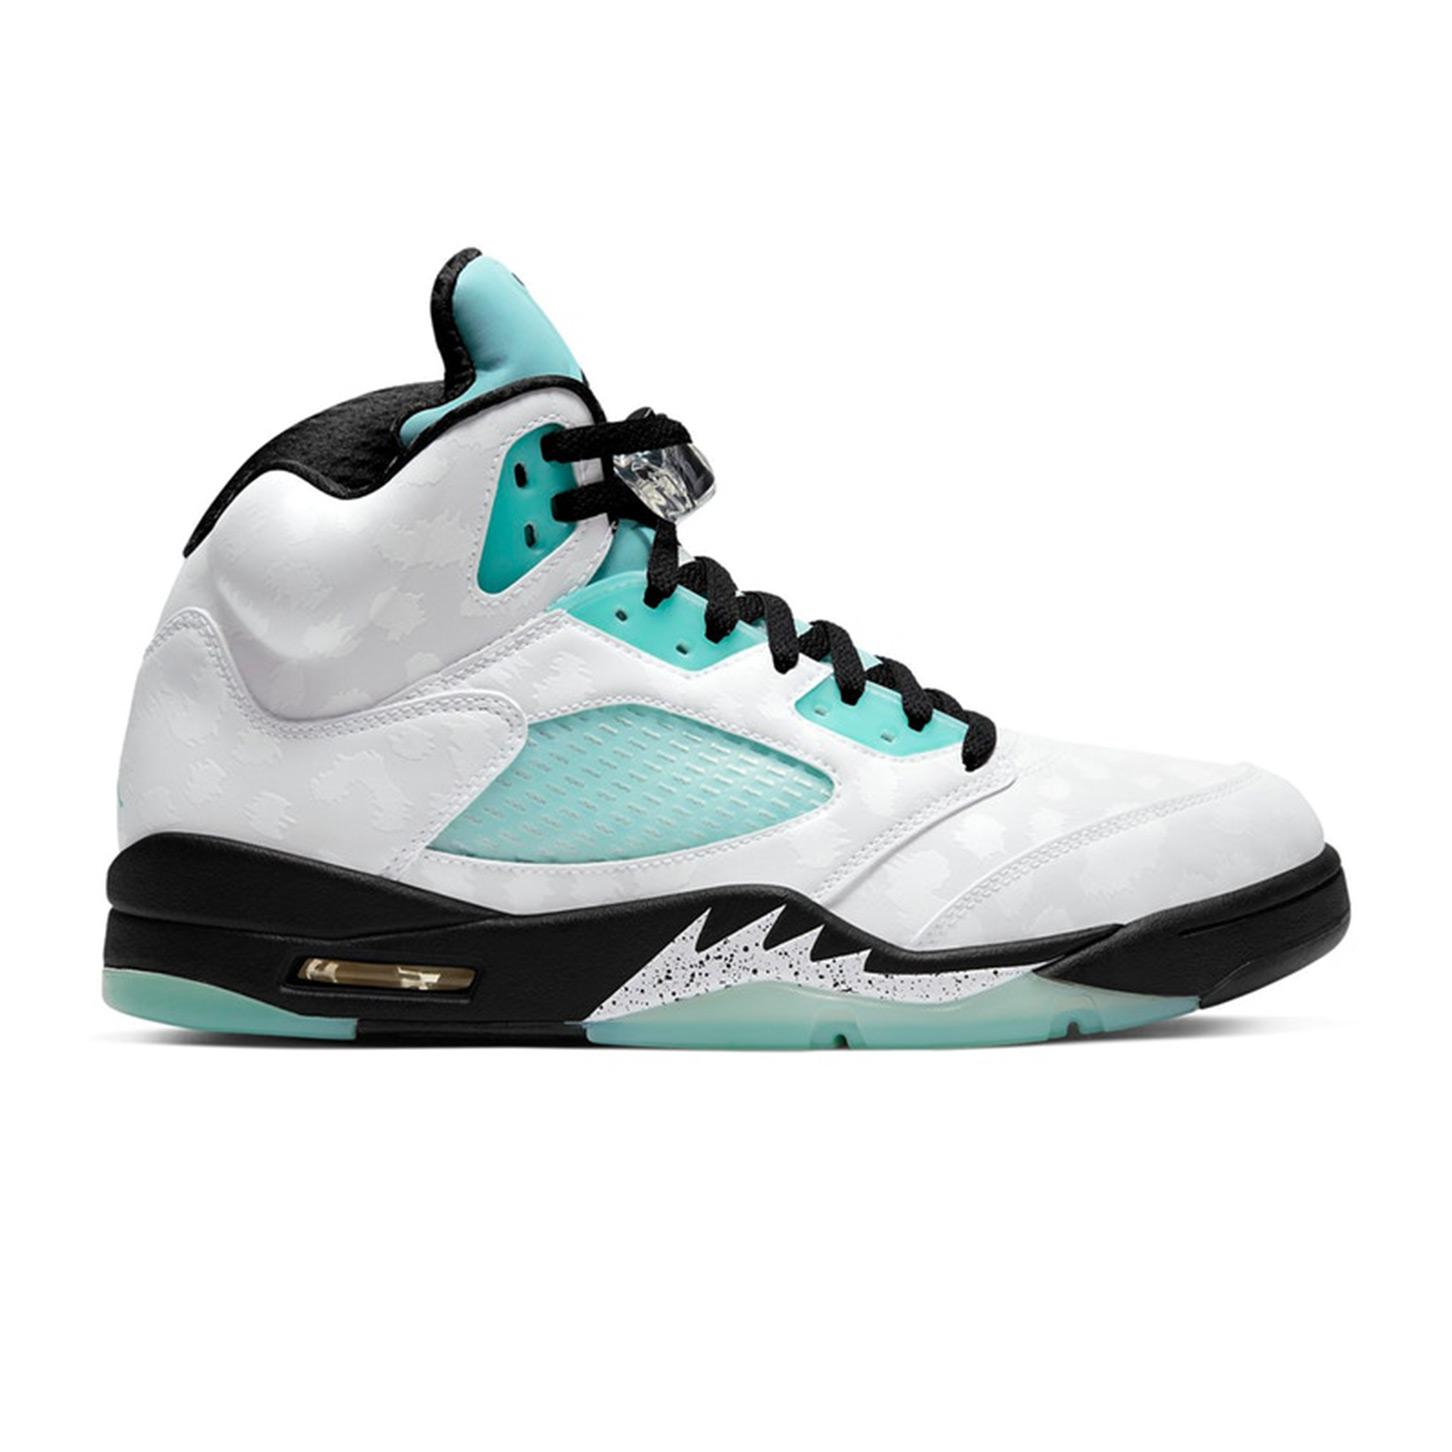 Jordan-5-Retro-Island-Green